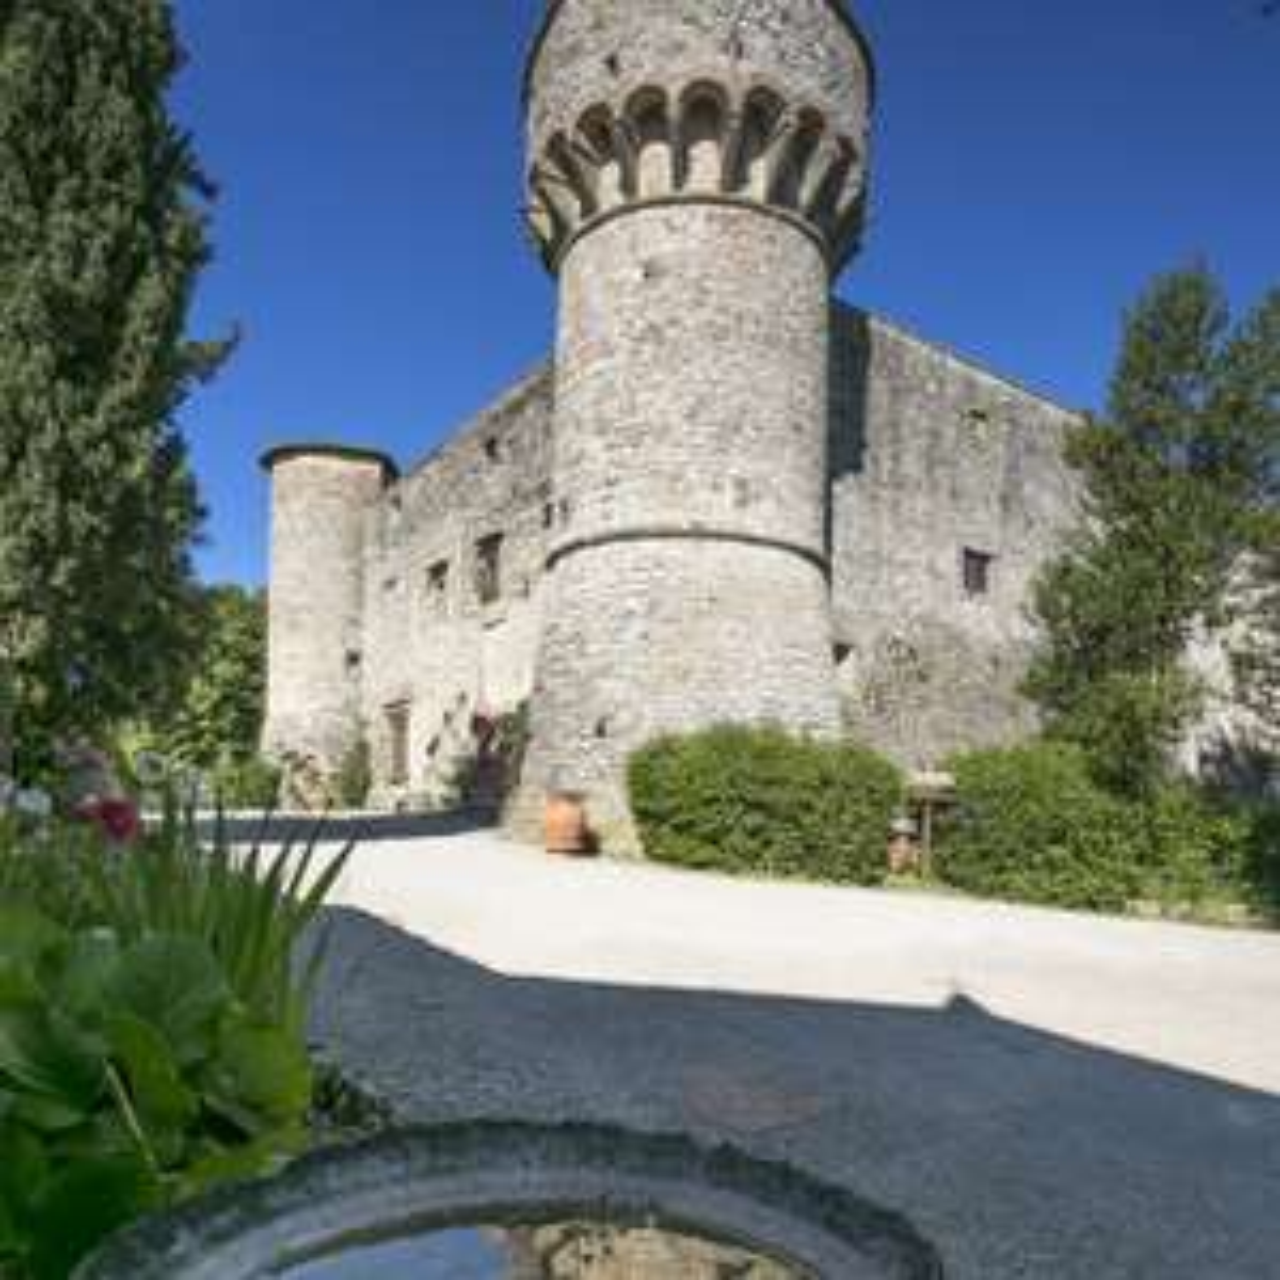 Chianti, Toskana: 3 Nächte - Apartment im Weingut - 4*Castello di Meleto inkl. Frühstück & Kochkurs / gratis Storno / Hauptsaison +50€